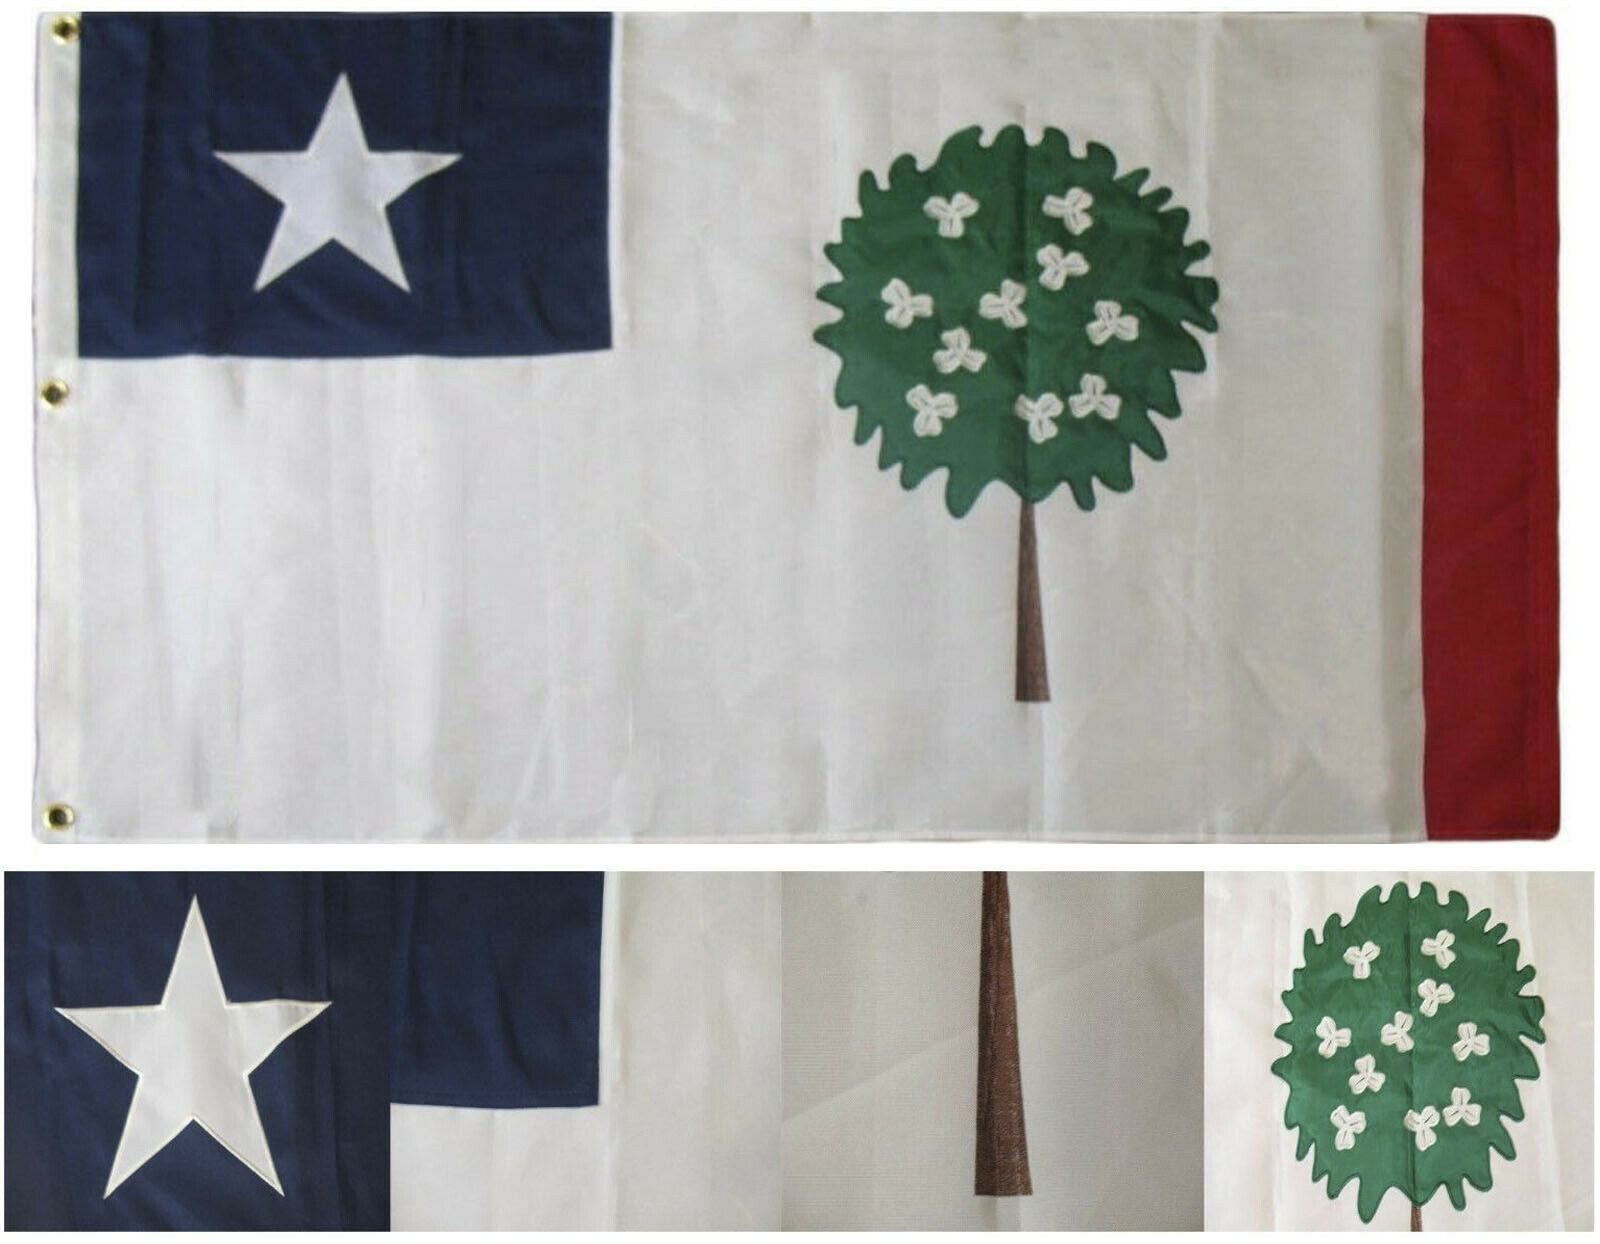 3x5 Bordado Cosidas Mississippi República Sintético Algodón 0.9mx5' Flag 3 Clips